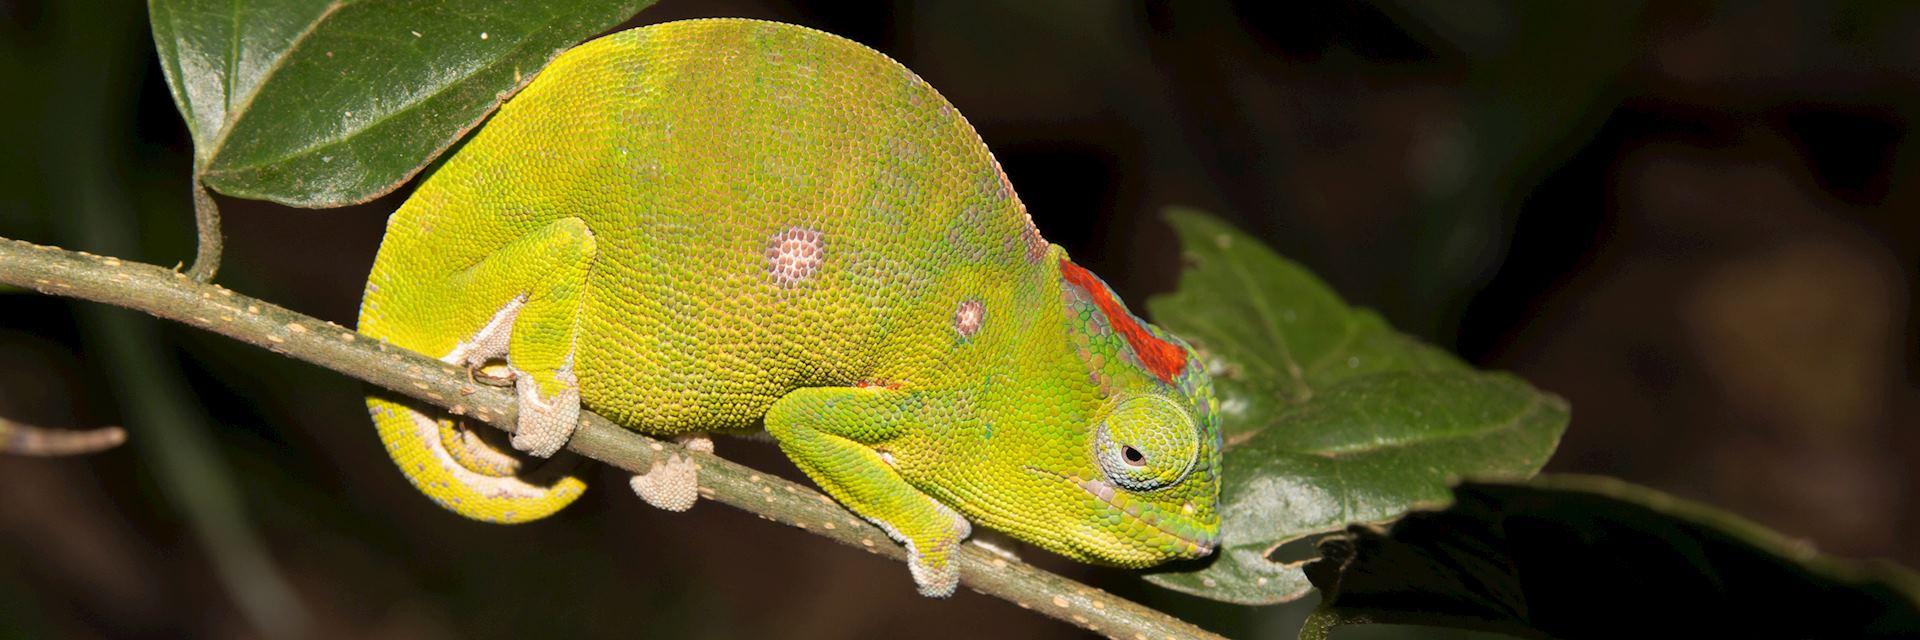 Carpet chameleon, Joffreville